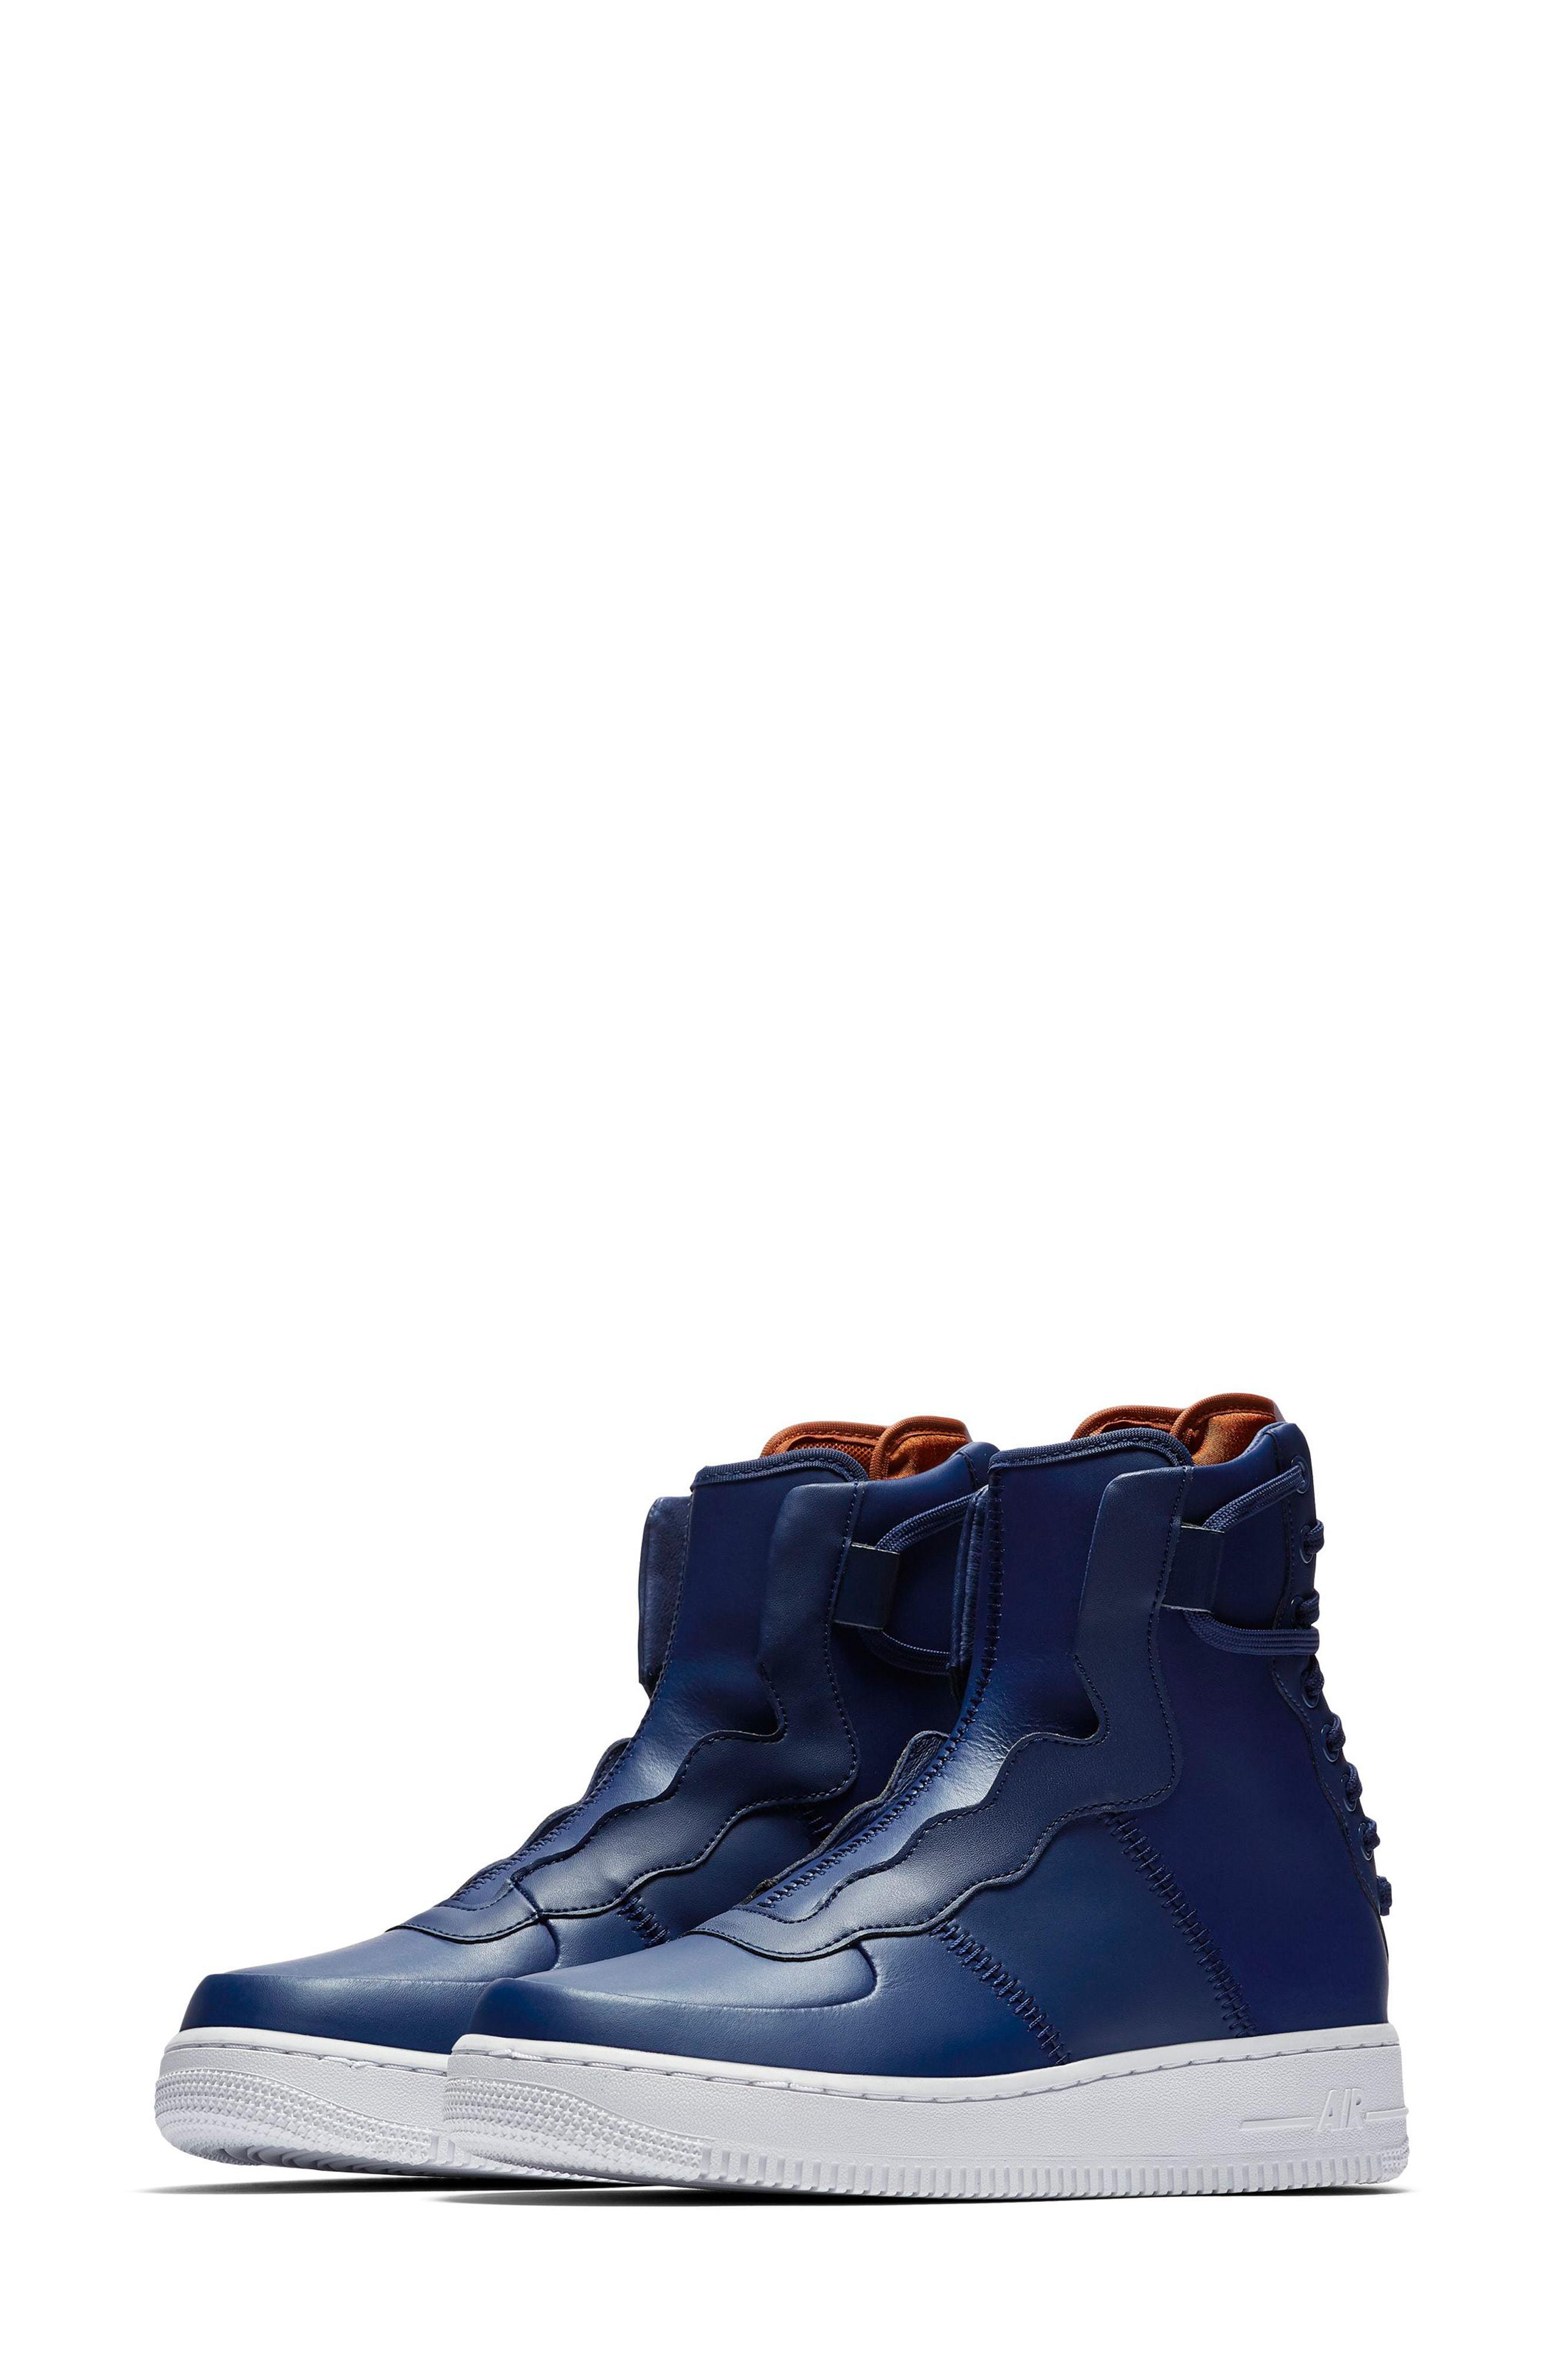 7778bec72be Lyst - Nike Air Force 1 Rebel Xx High Top Sneaker - Save 13%